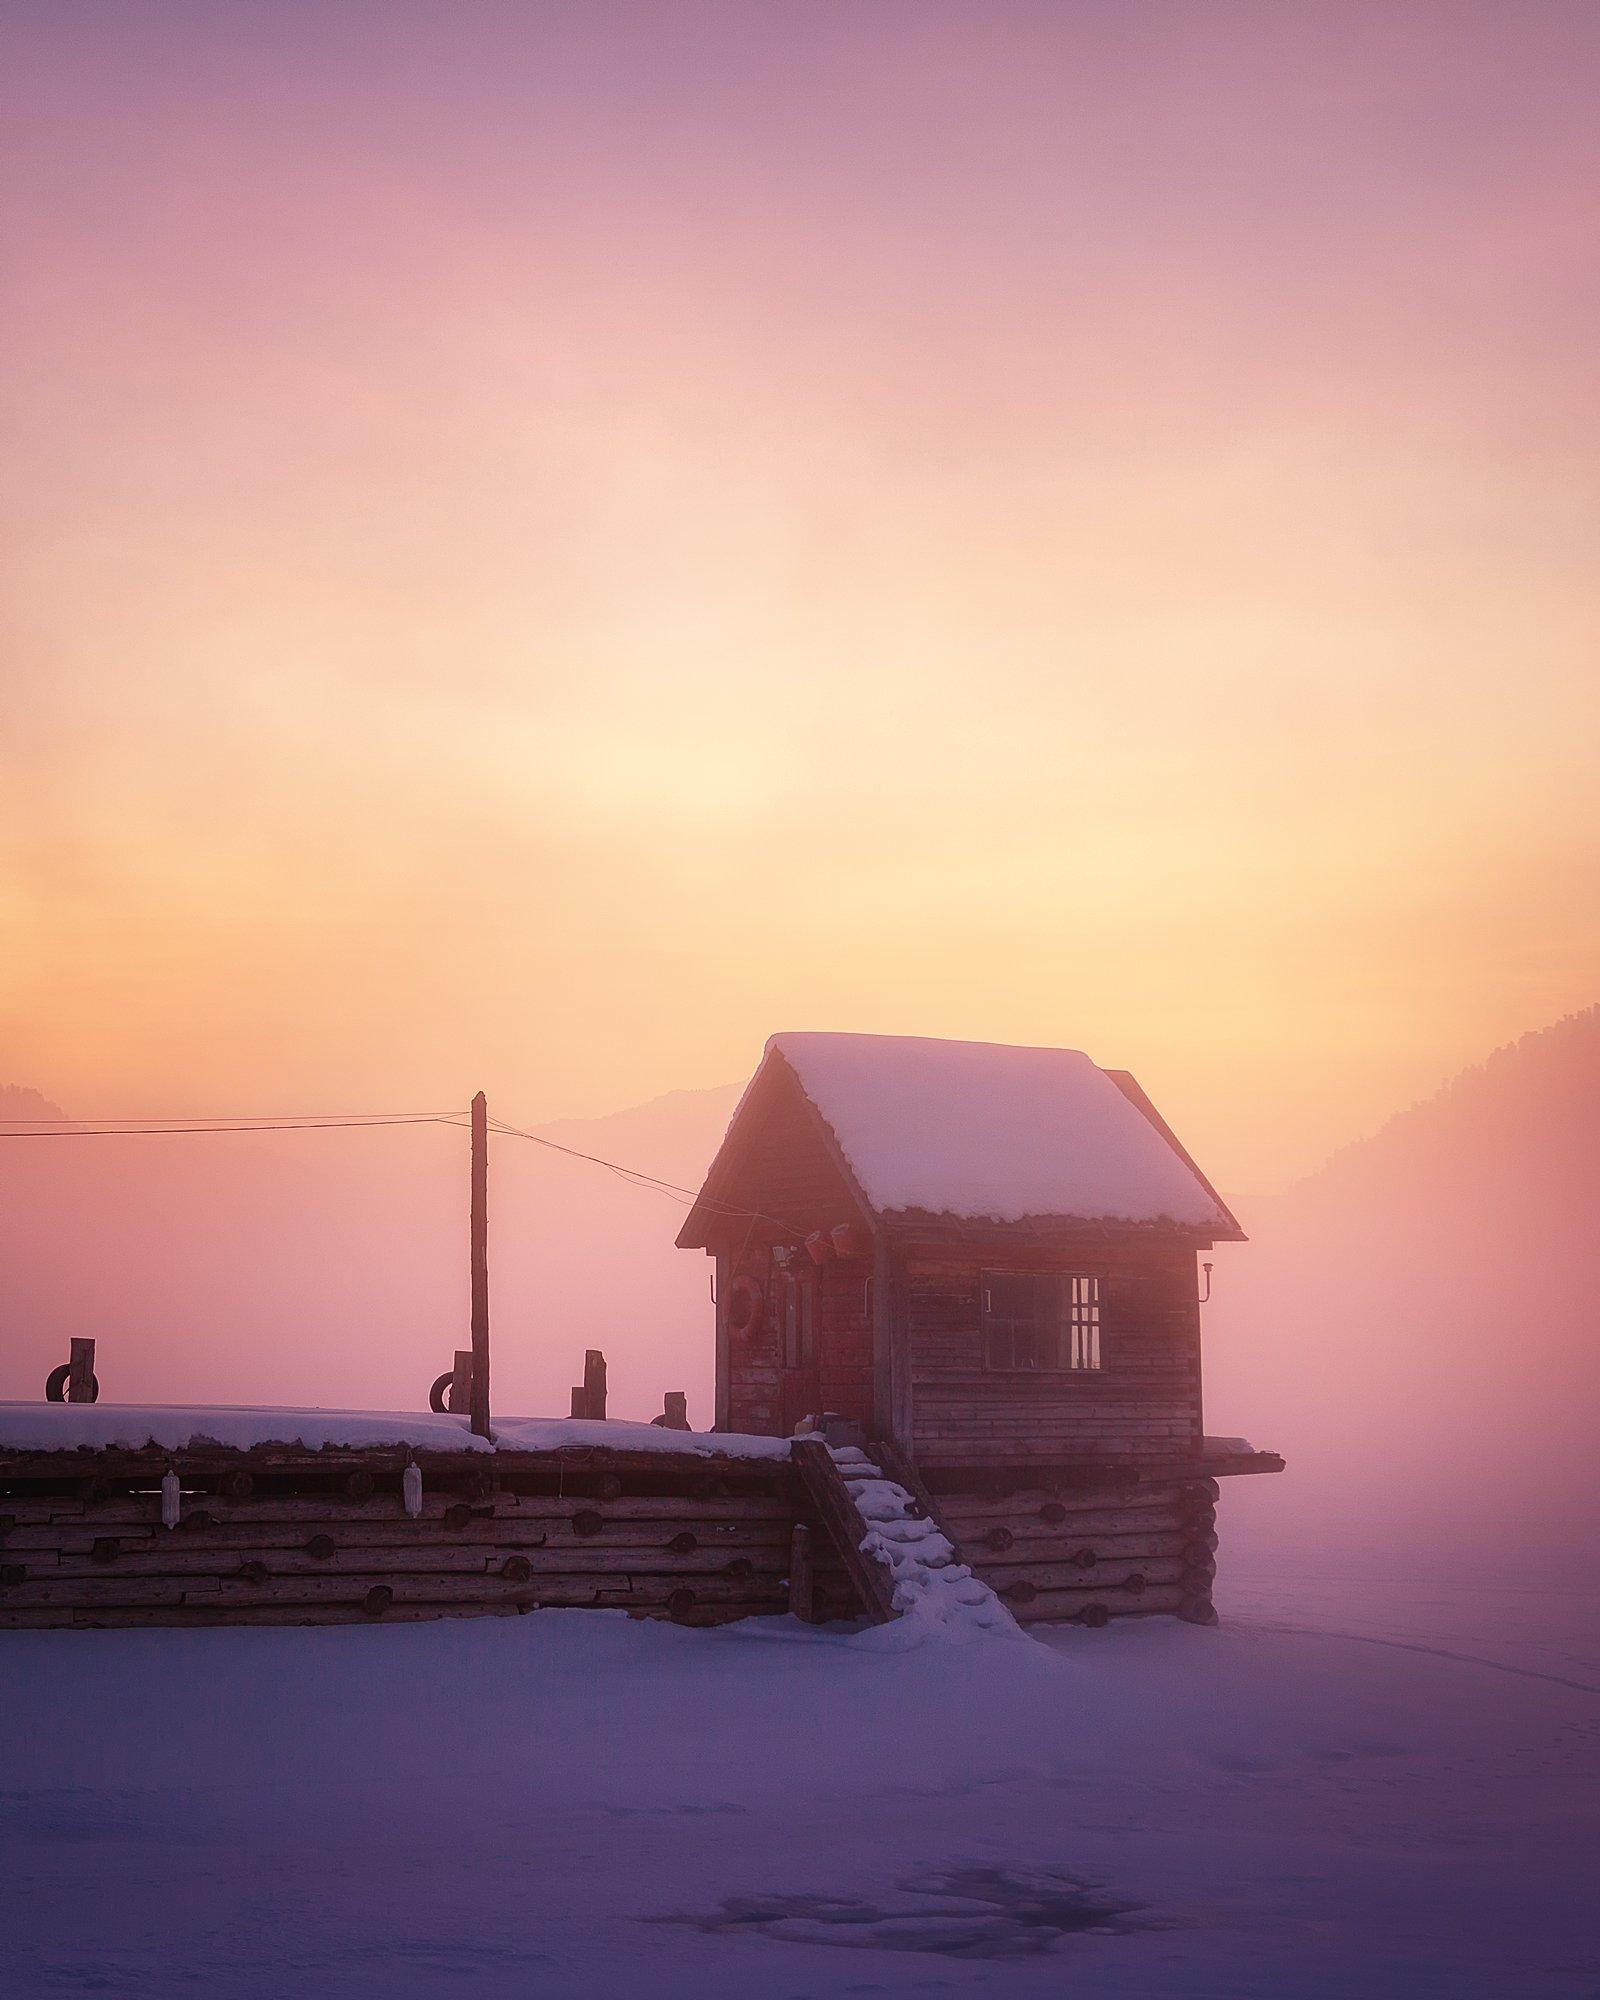 Алтай, Телецкое озеро, Артыбаш, Canon, рассвет, туман, мороз, Ира Булавинцева